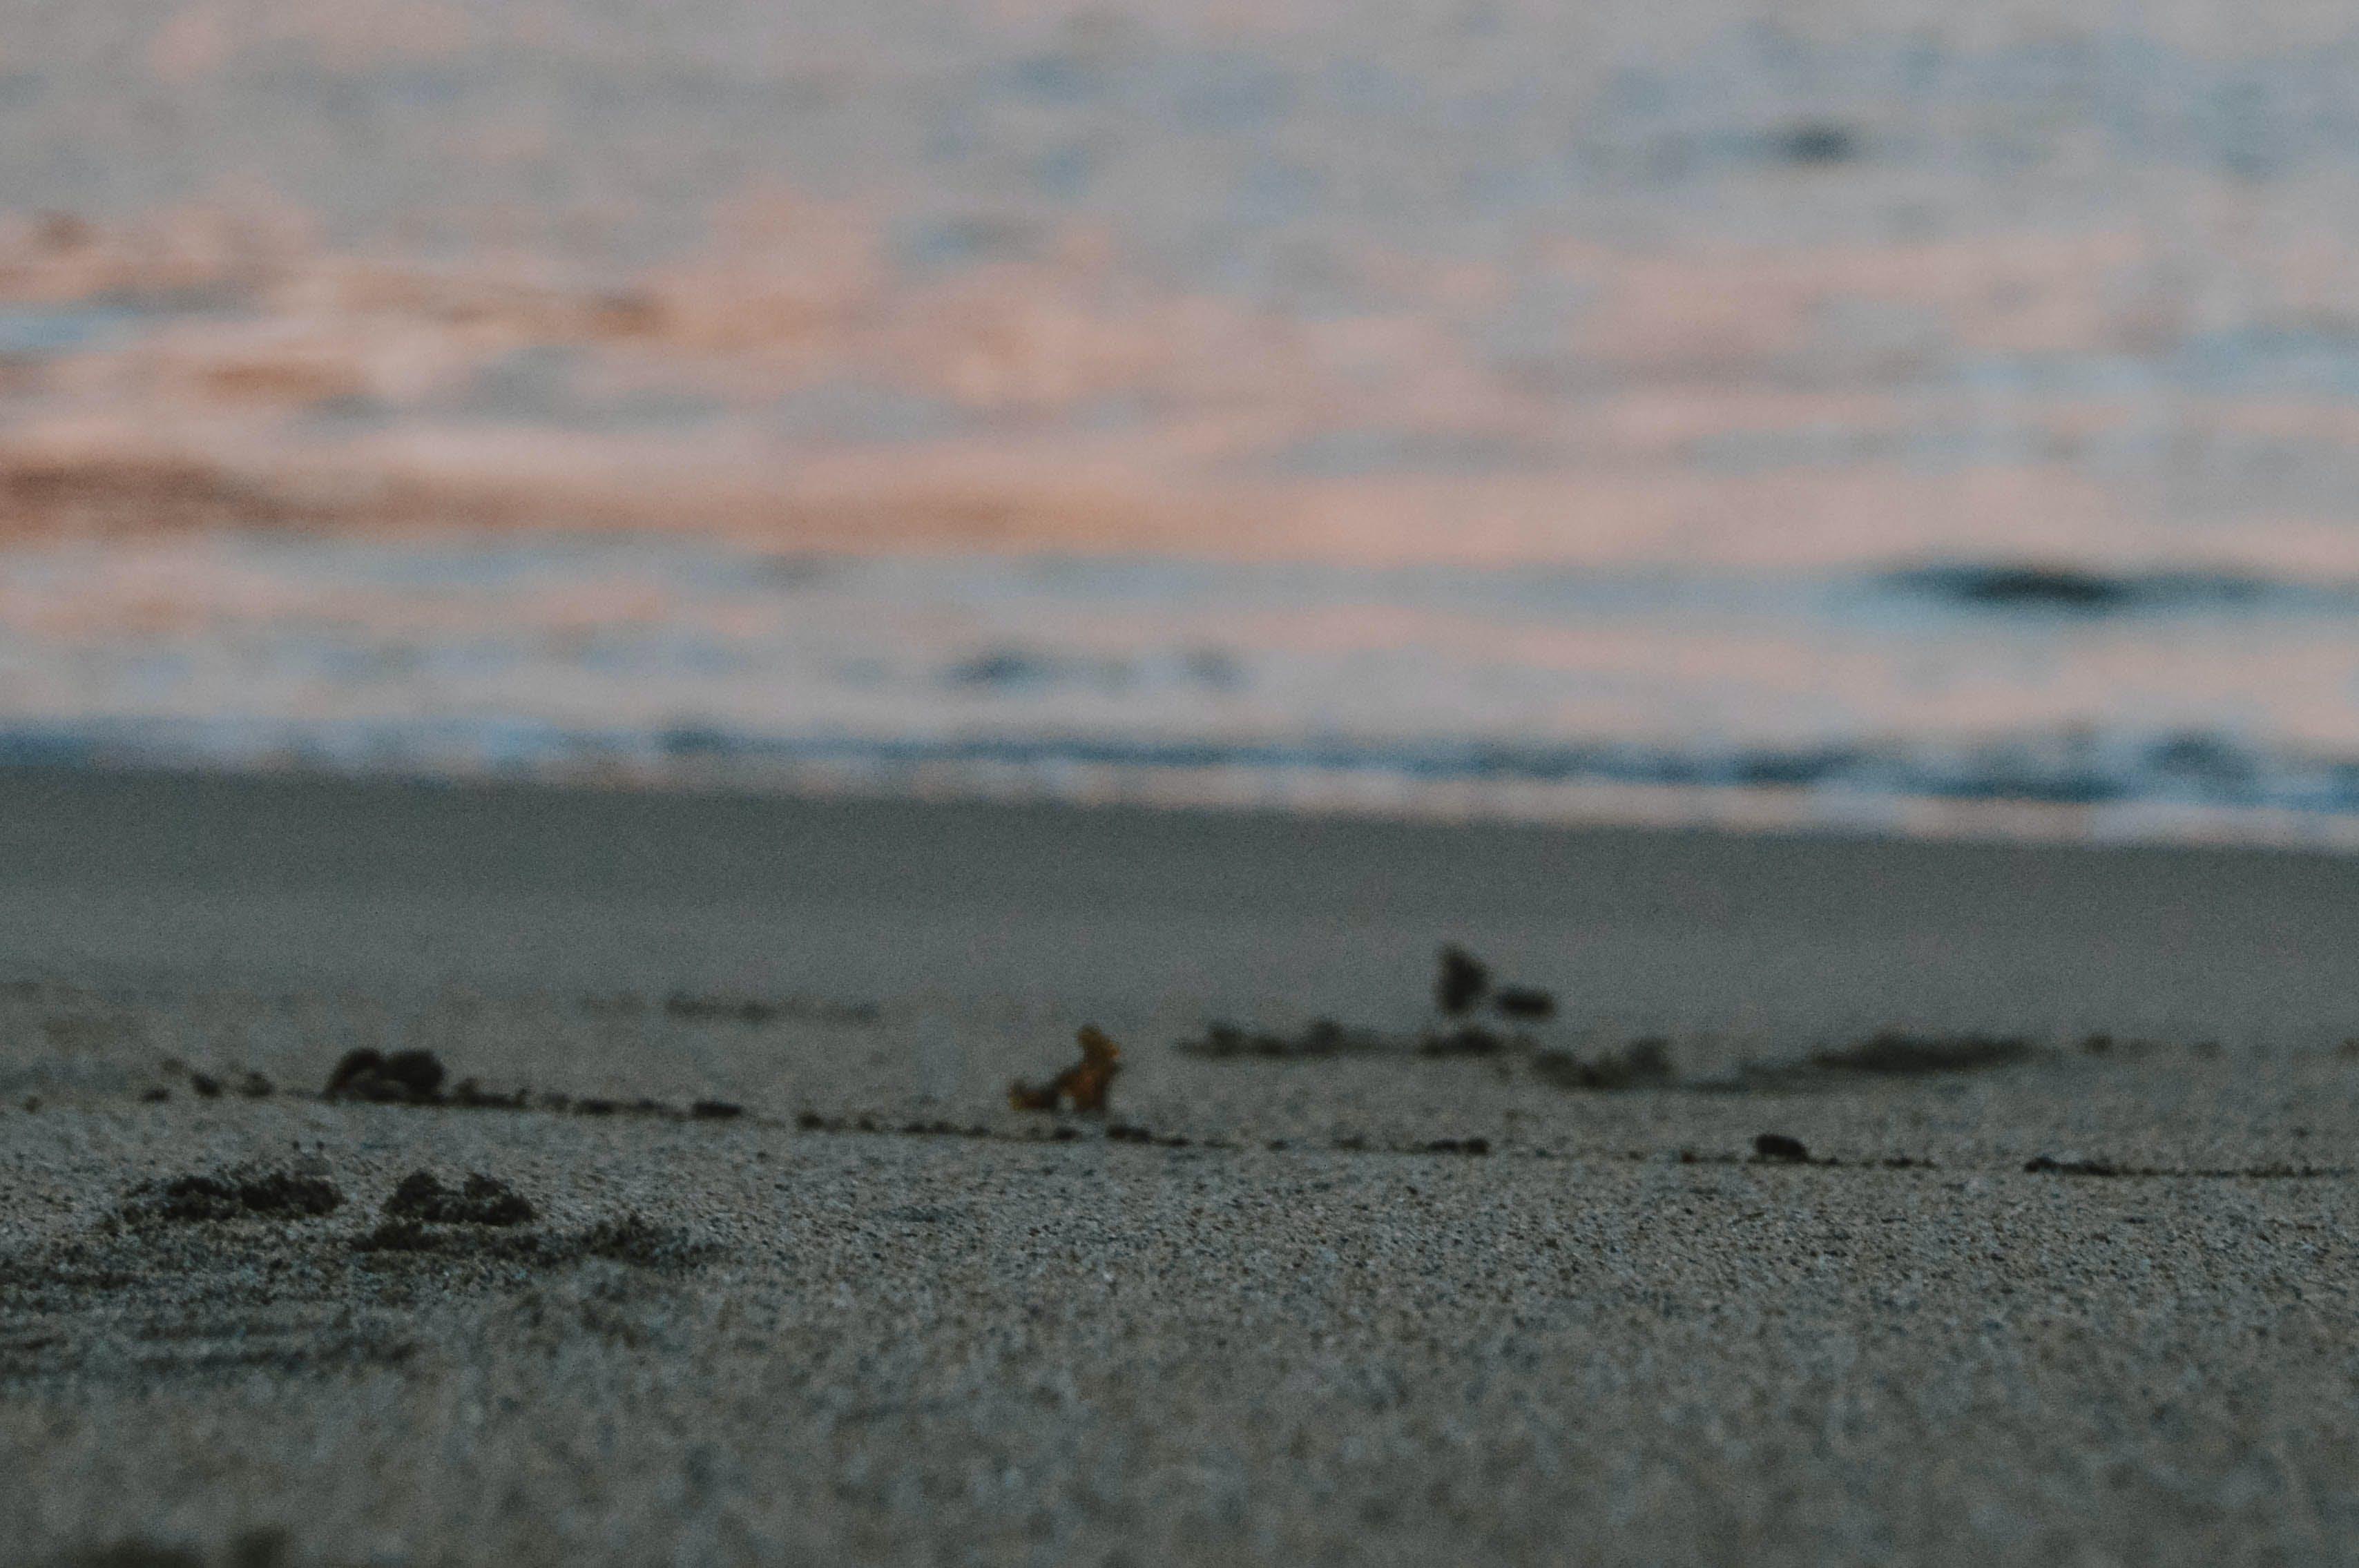 Free stock photo of alone, beach, black sand, blue water